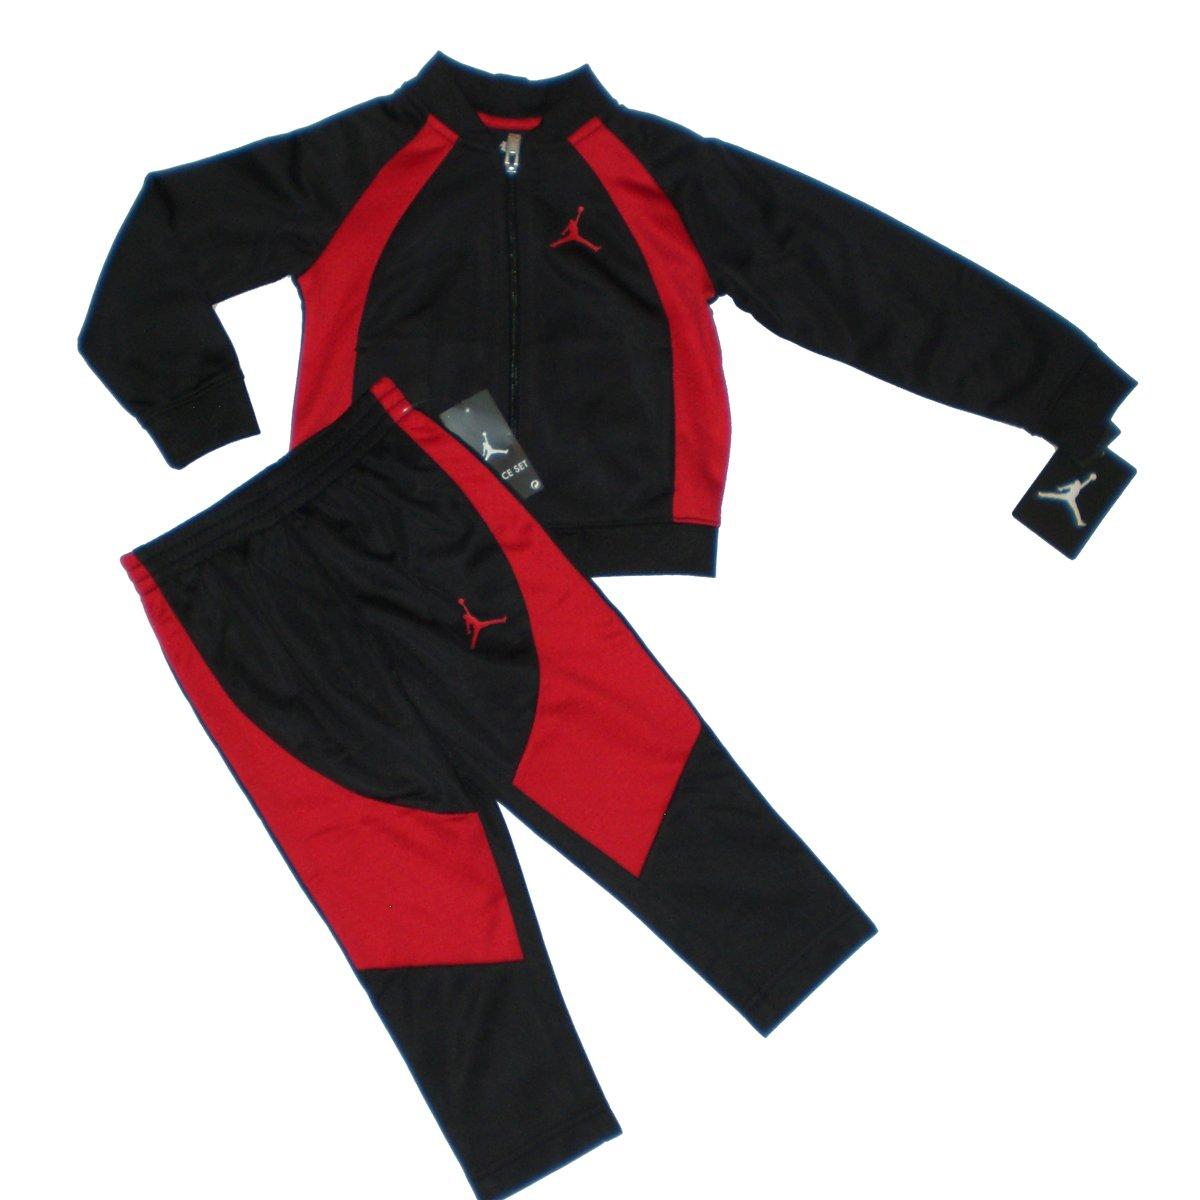 Jordan Jumpman Boy Jacket Tracksuit Pants Outfit Set, Size 4